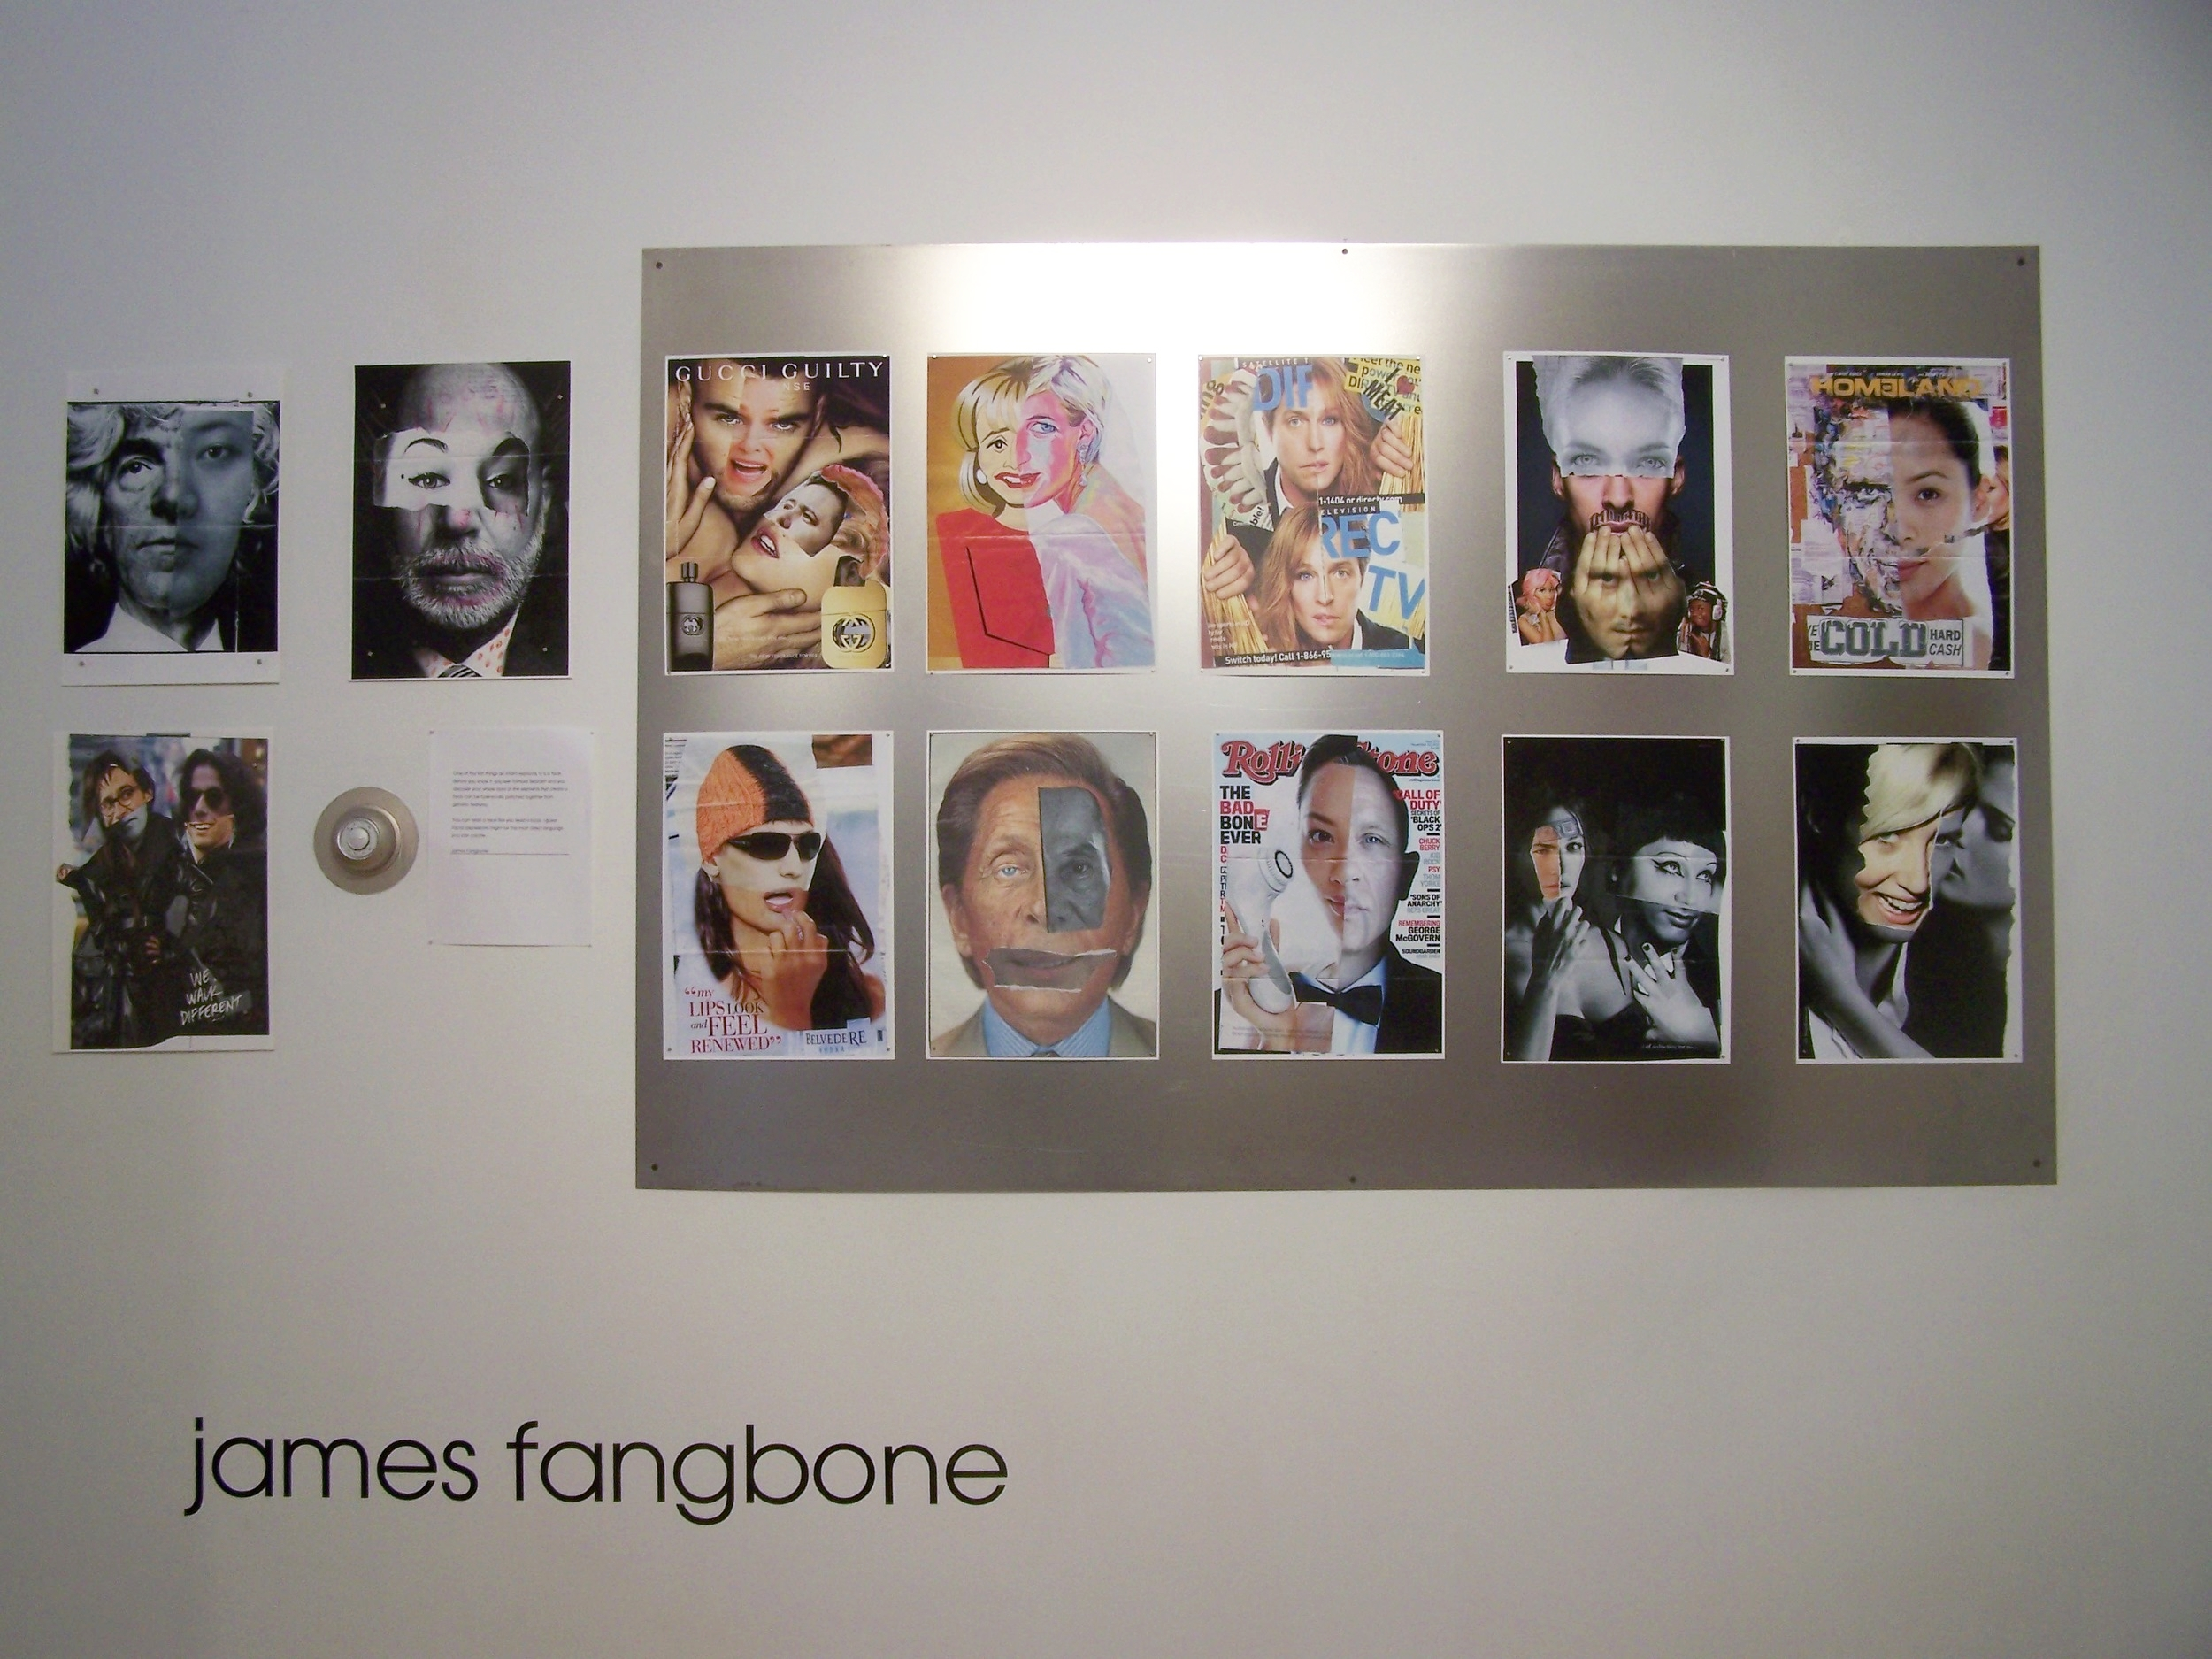 James Fangbone